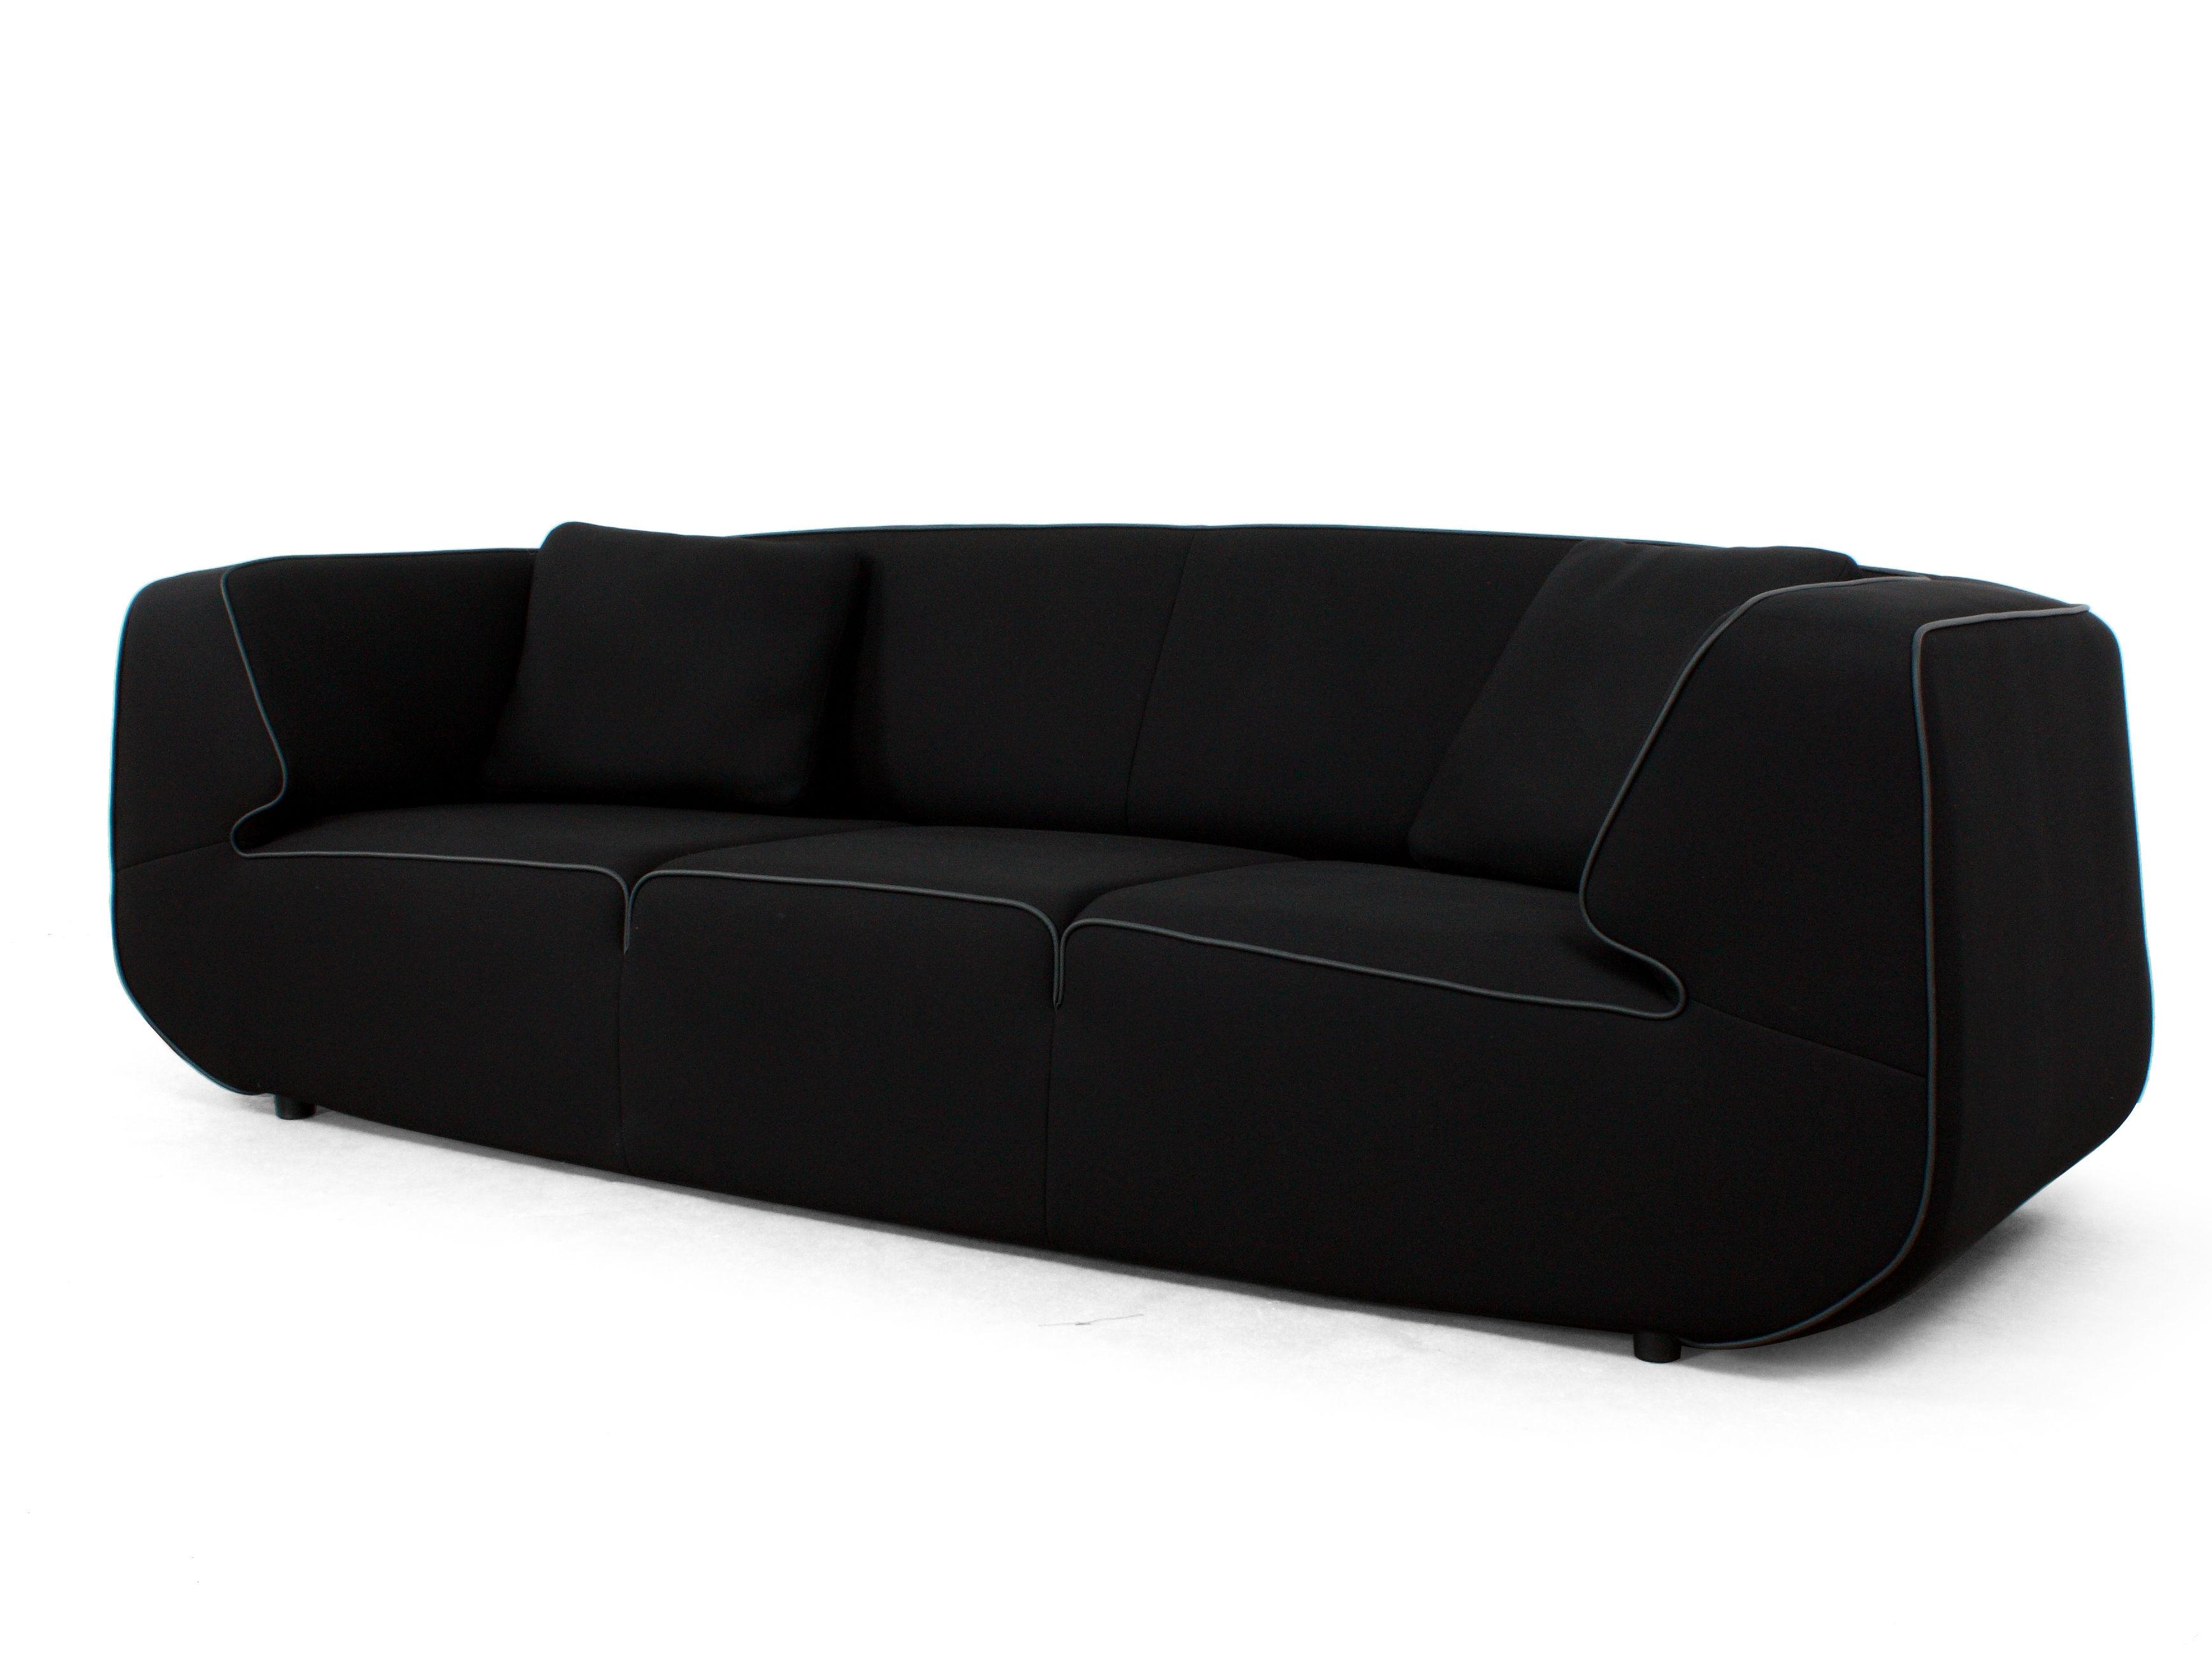 canap droit bump by ora ito xl 3 places l 238 cm noir noir dunlopillo made in design. Black Bedroom Furniture Sets. Home Design Ideas